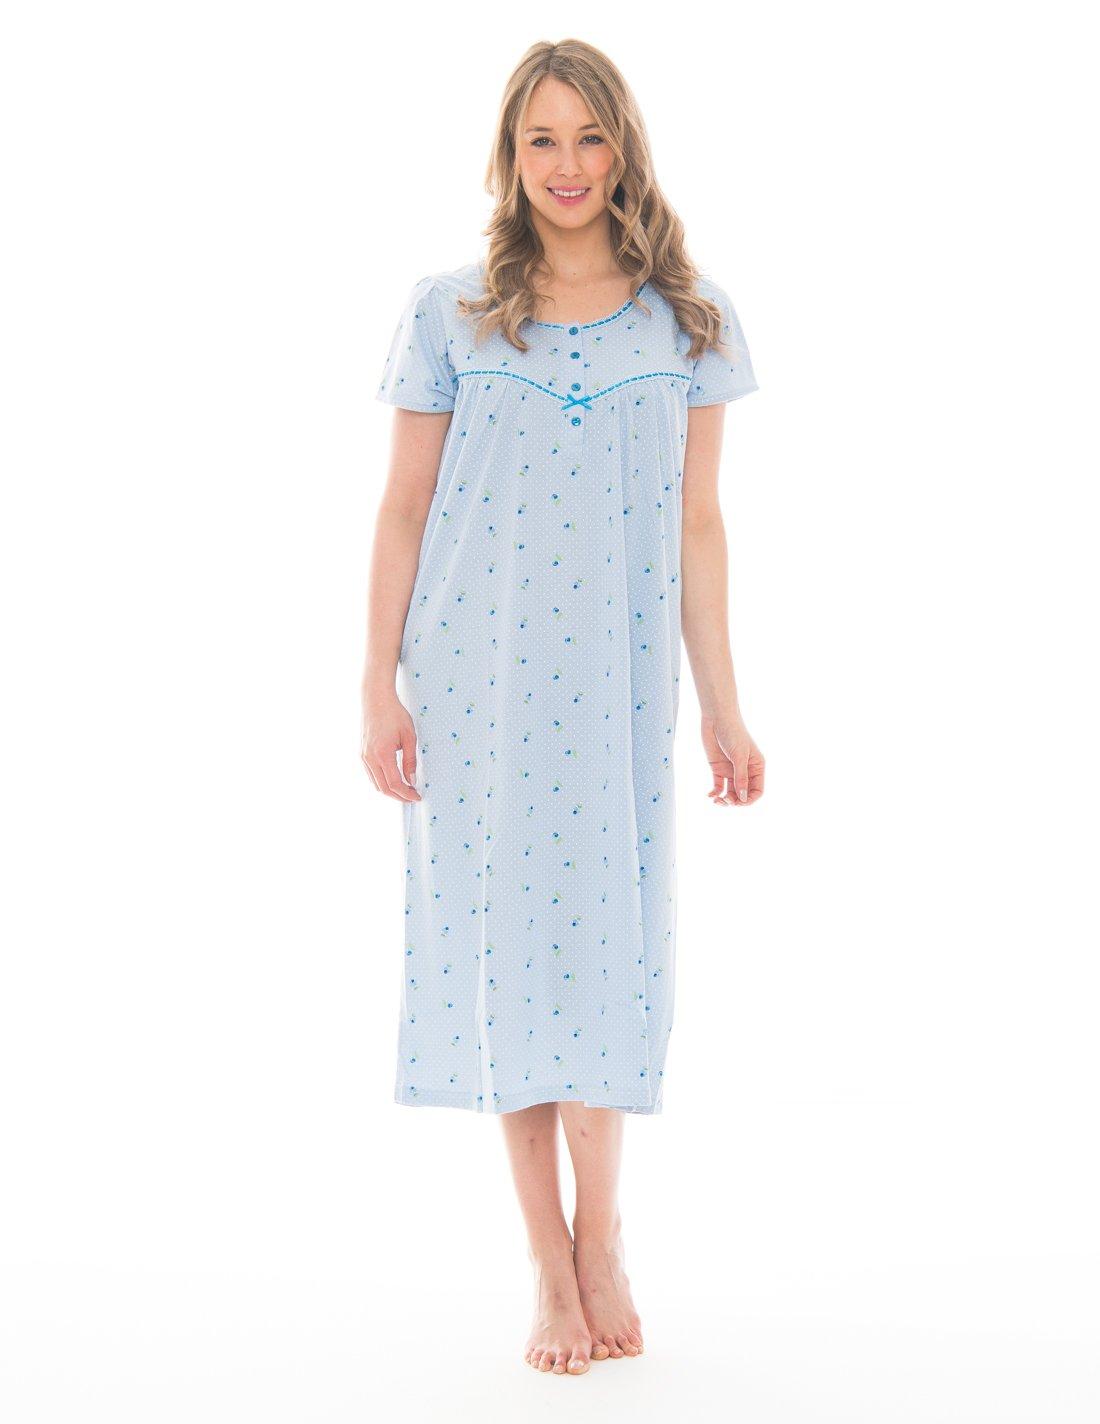 Pink Lady Women's Soft Short Sleeve Full Length Nightgown CKC_PLC_414-Parent